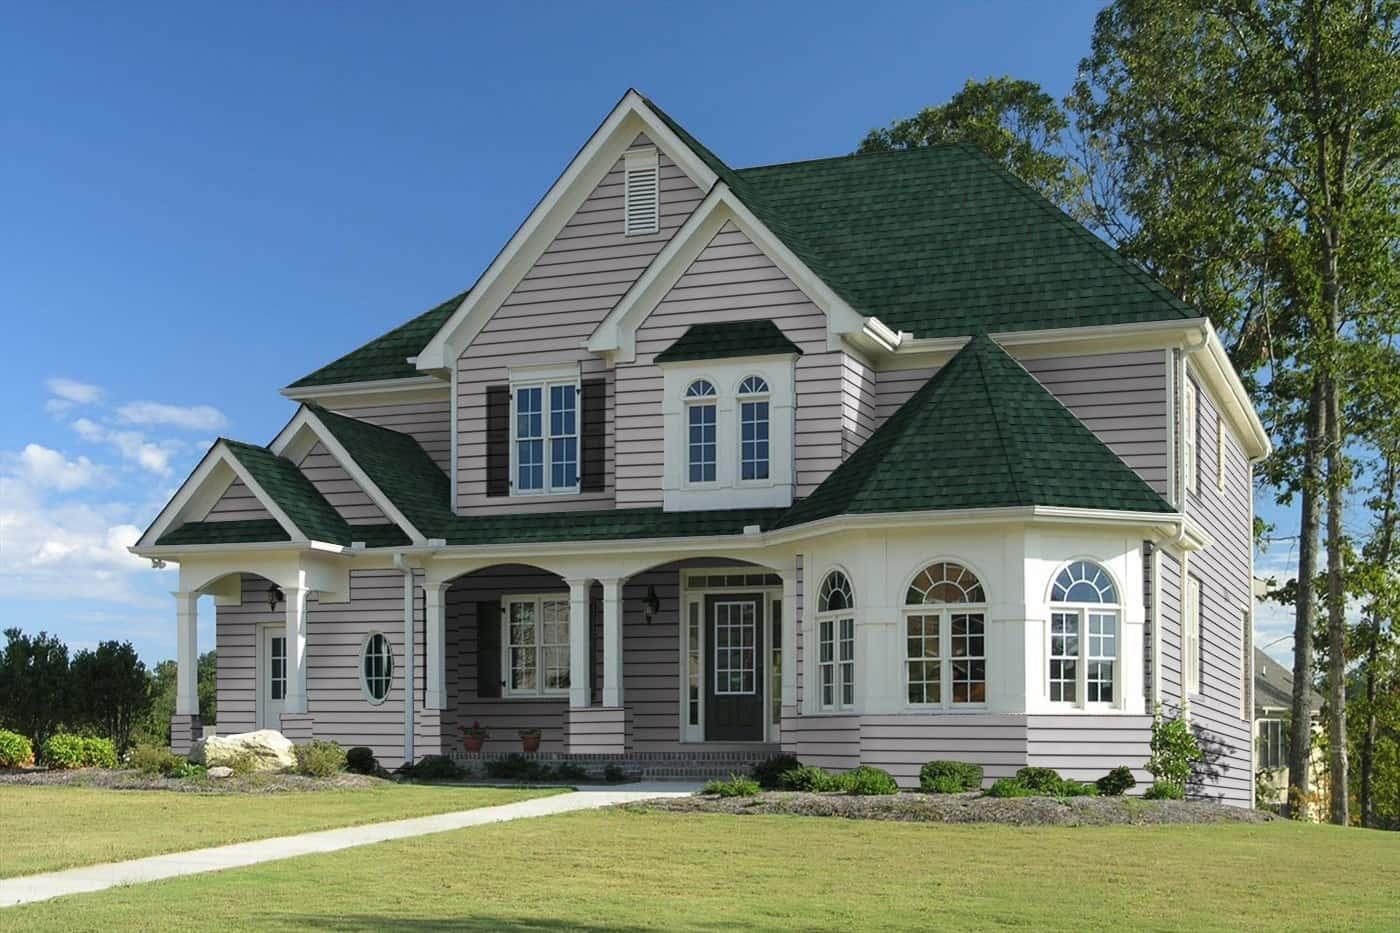 TAMKO Heritage Premium Rustic Evergreen House